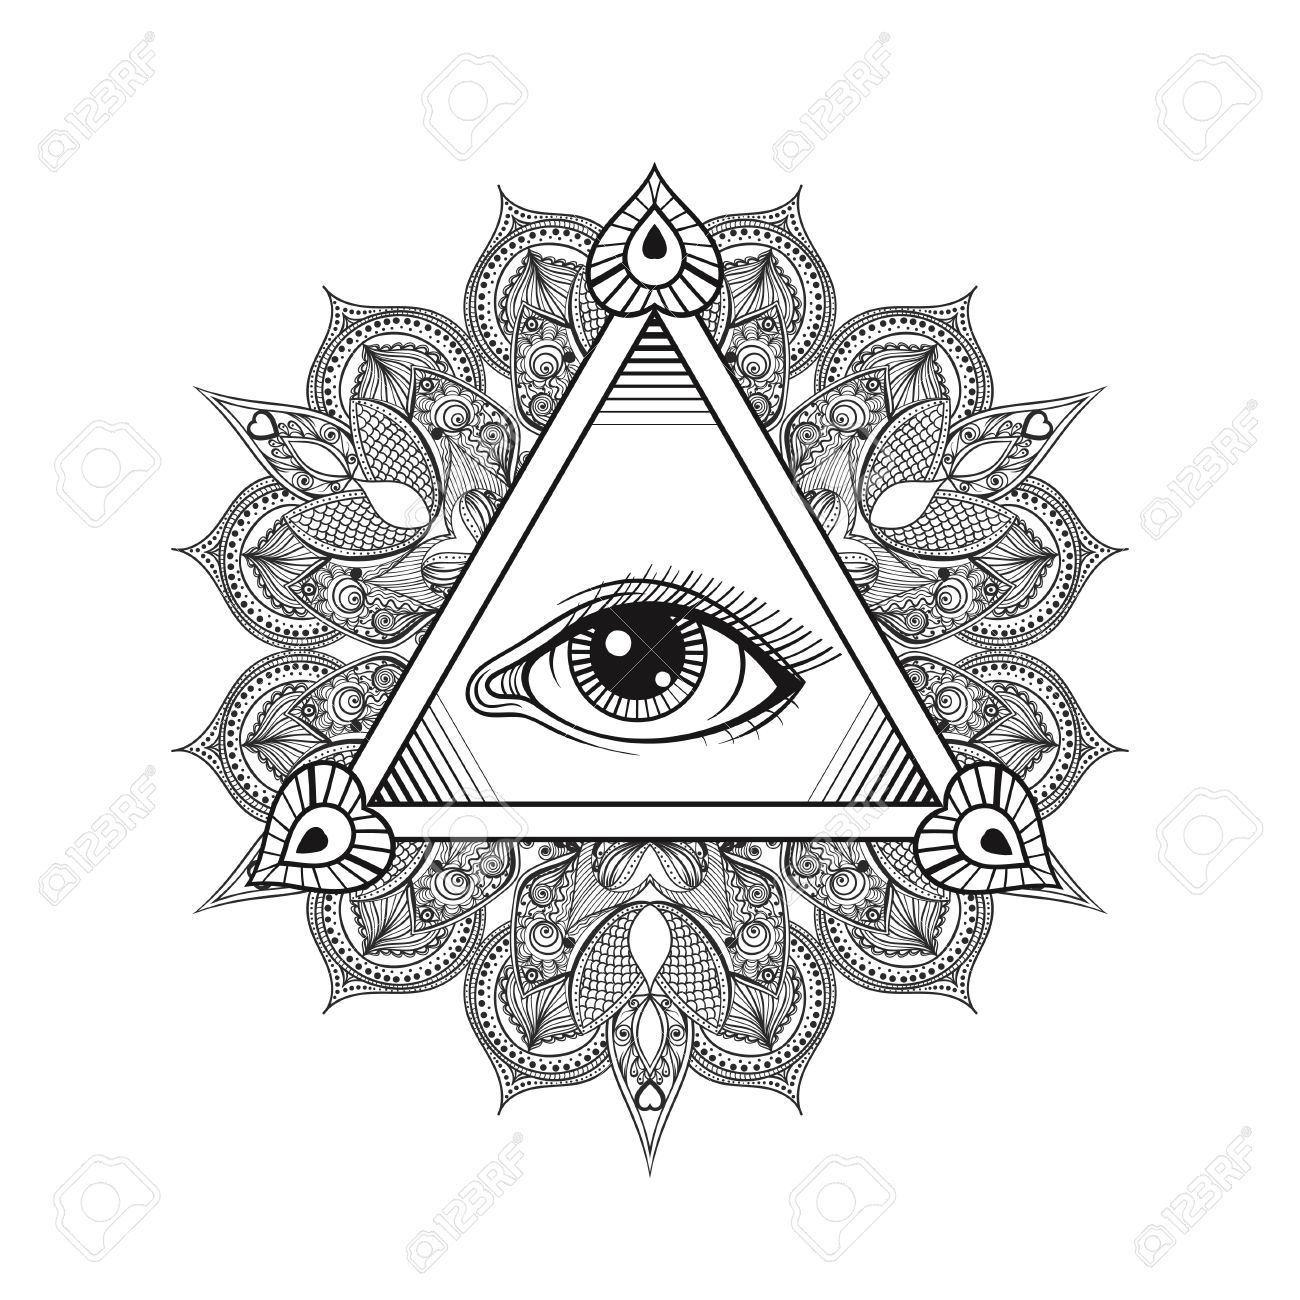 1300x1300 Vector All Seeing Eye Pyramid Symbol. Tattoo Design. Vintage